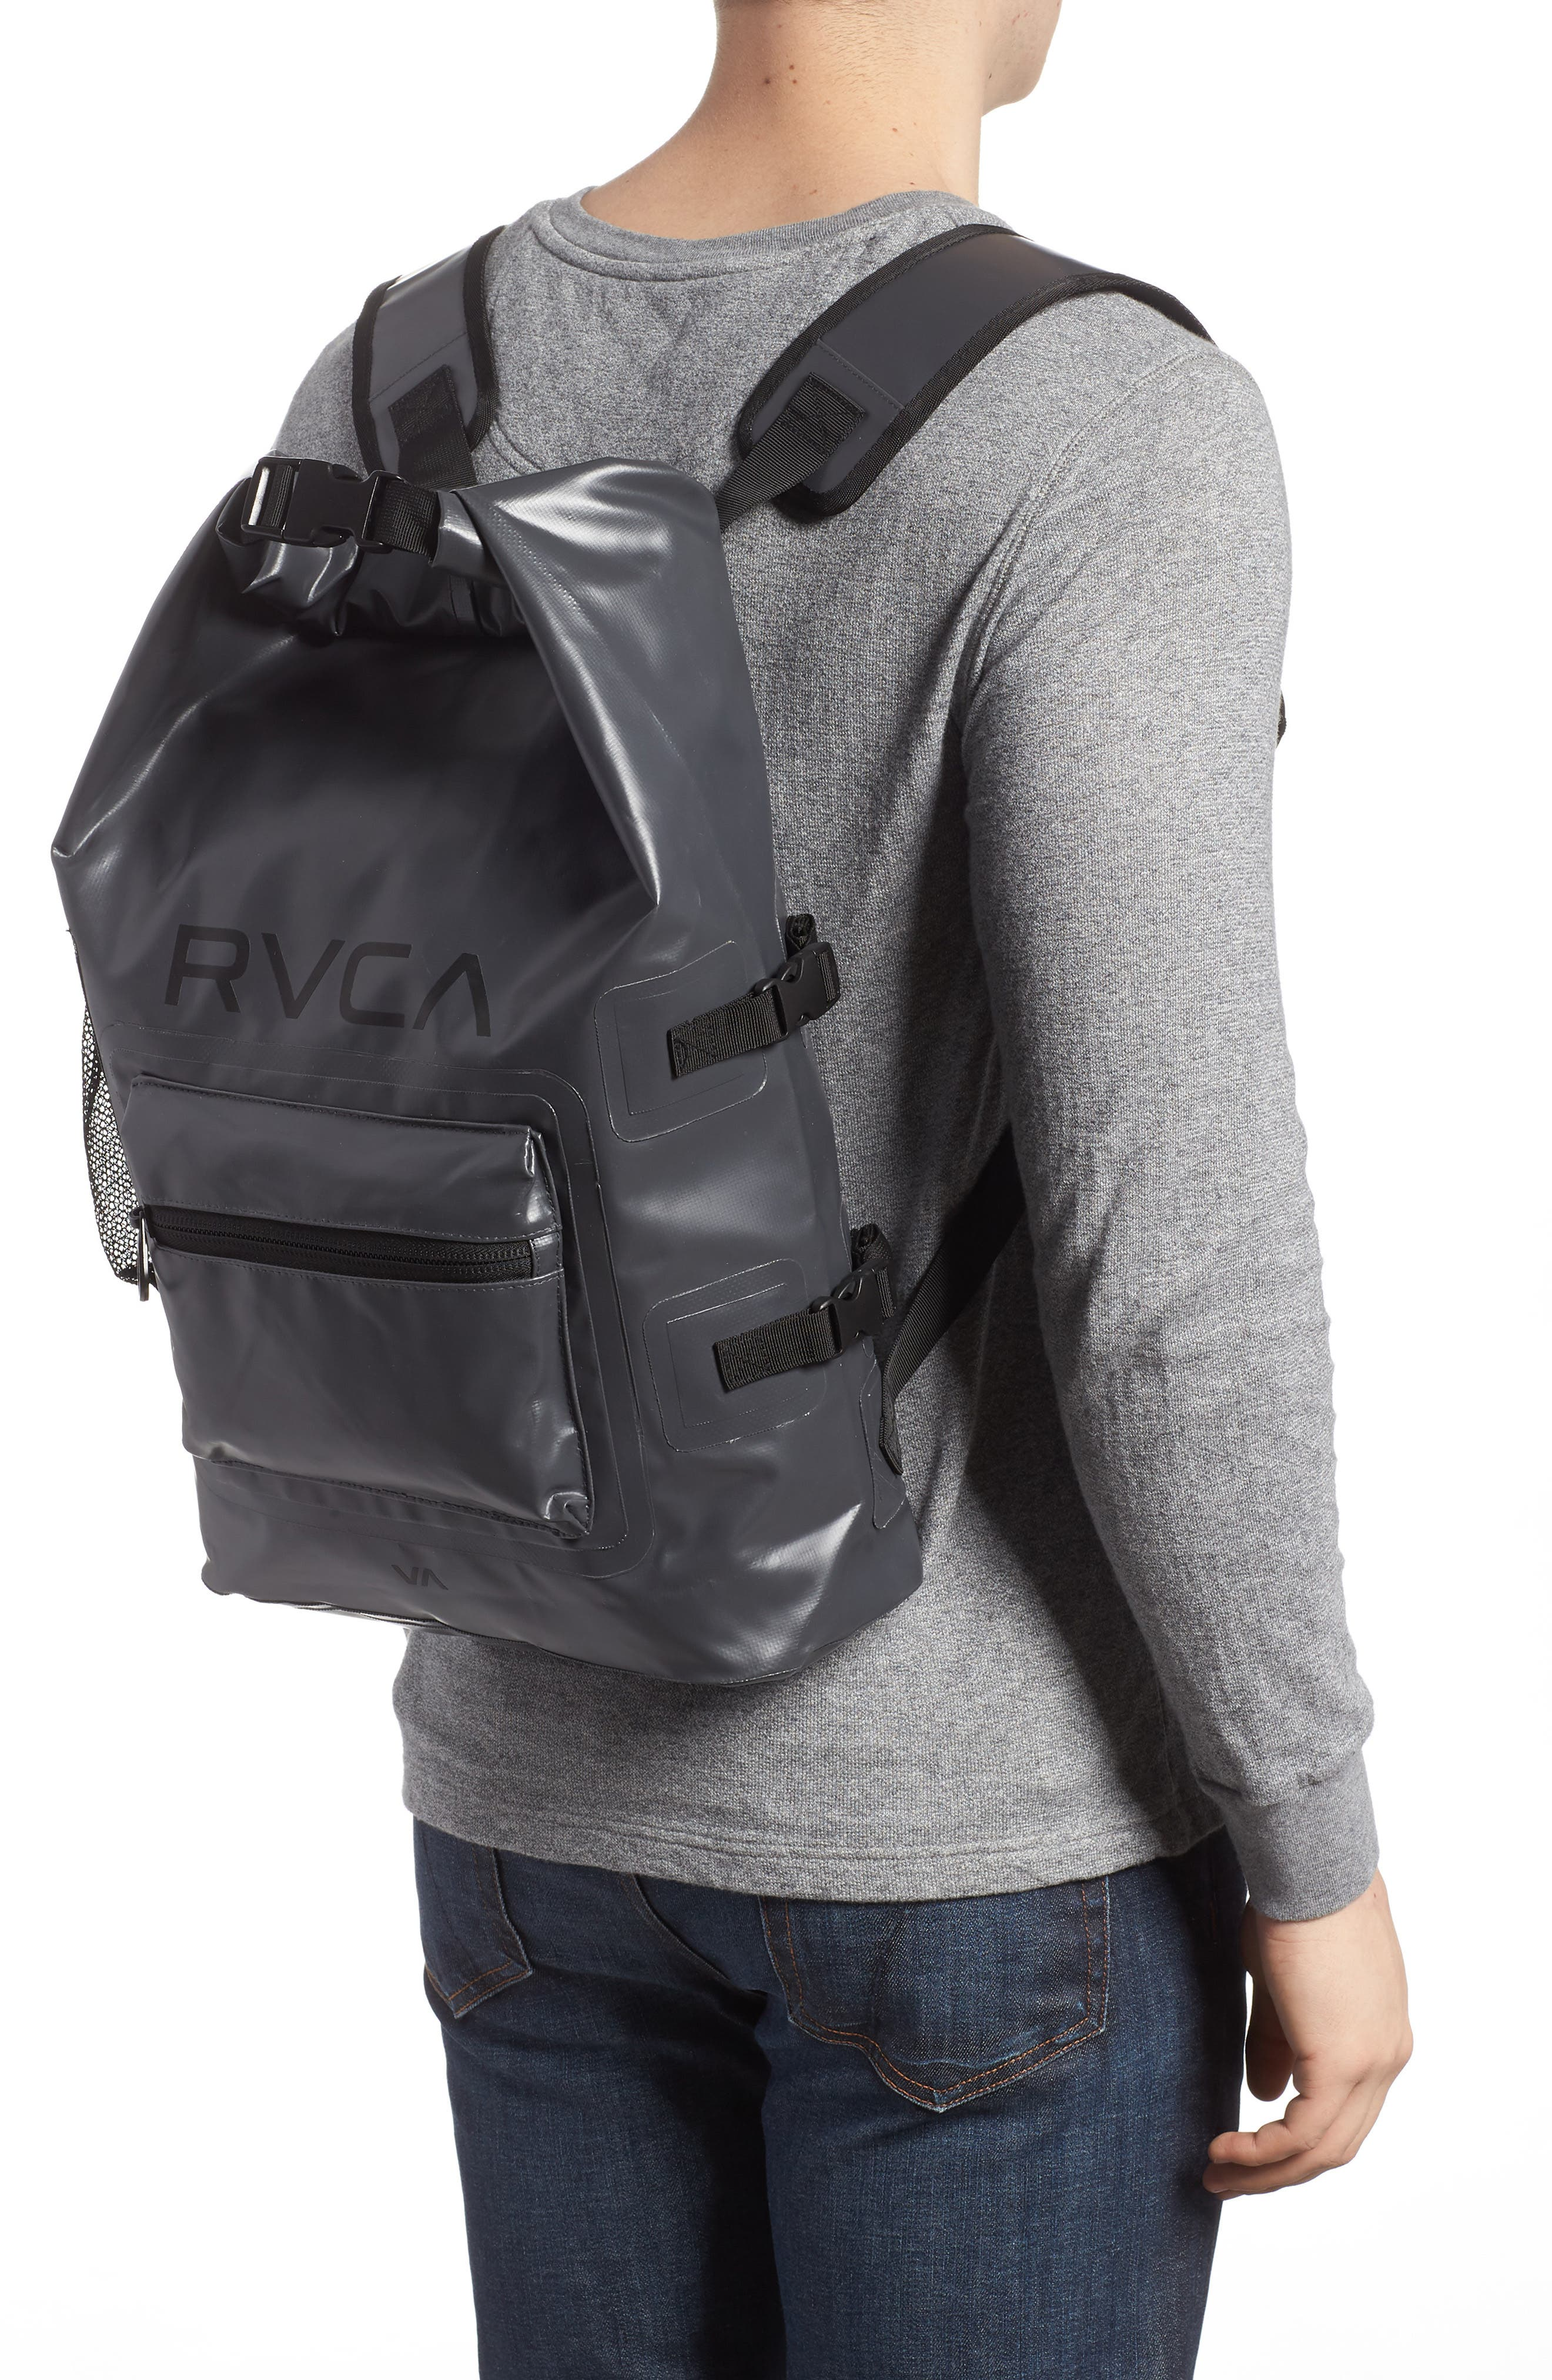 Go Be II Waterproof Backpack,                             Alternate thumbnail 2, color,                             Charcoal